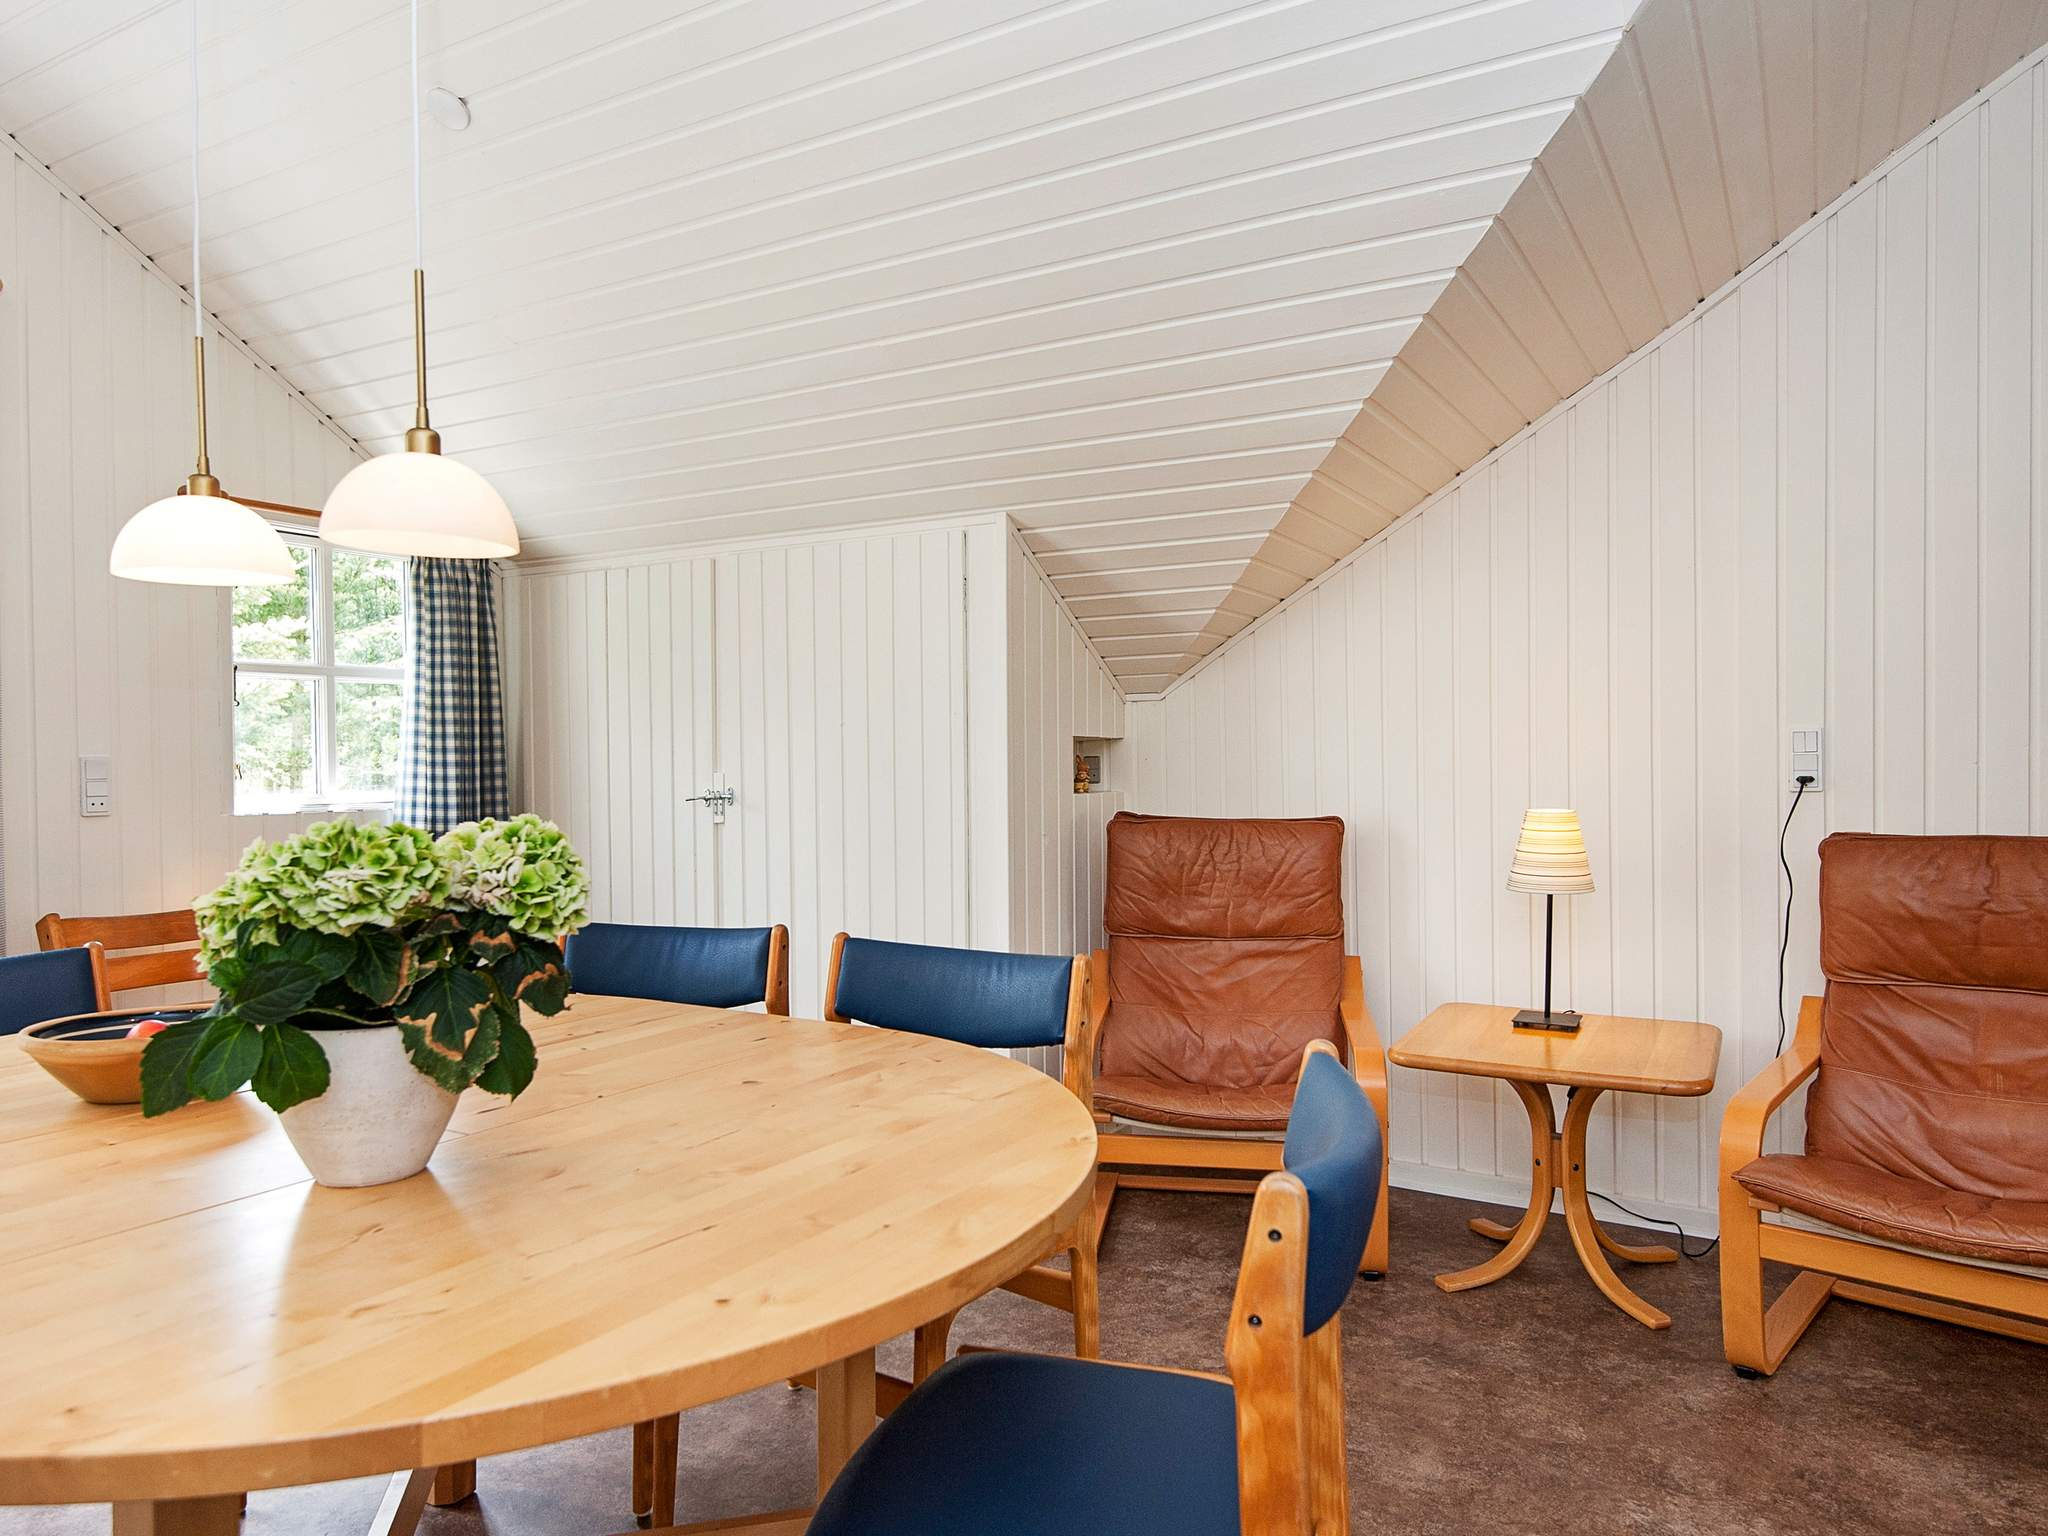 Ferienhaus Ry (83836), Ry, , Ostjütland, Dänemark, Bild 13